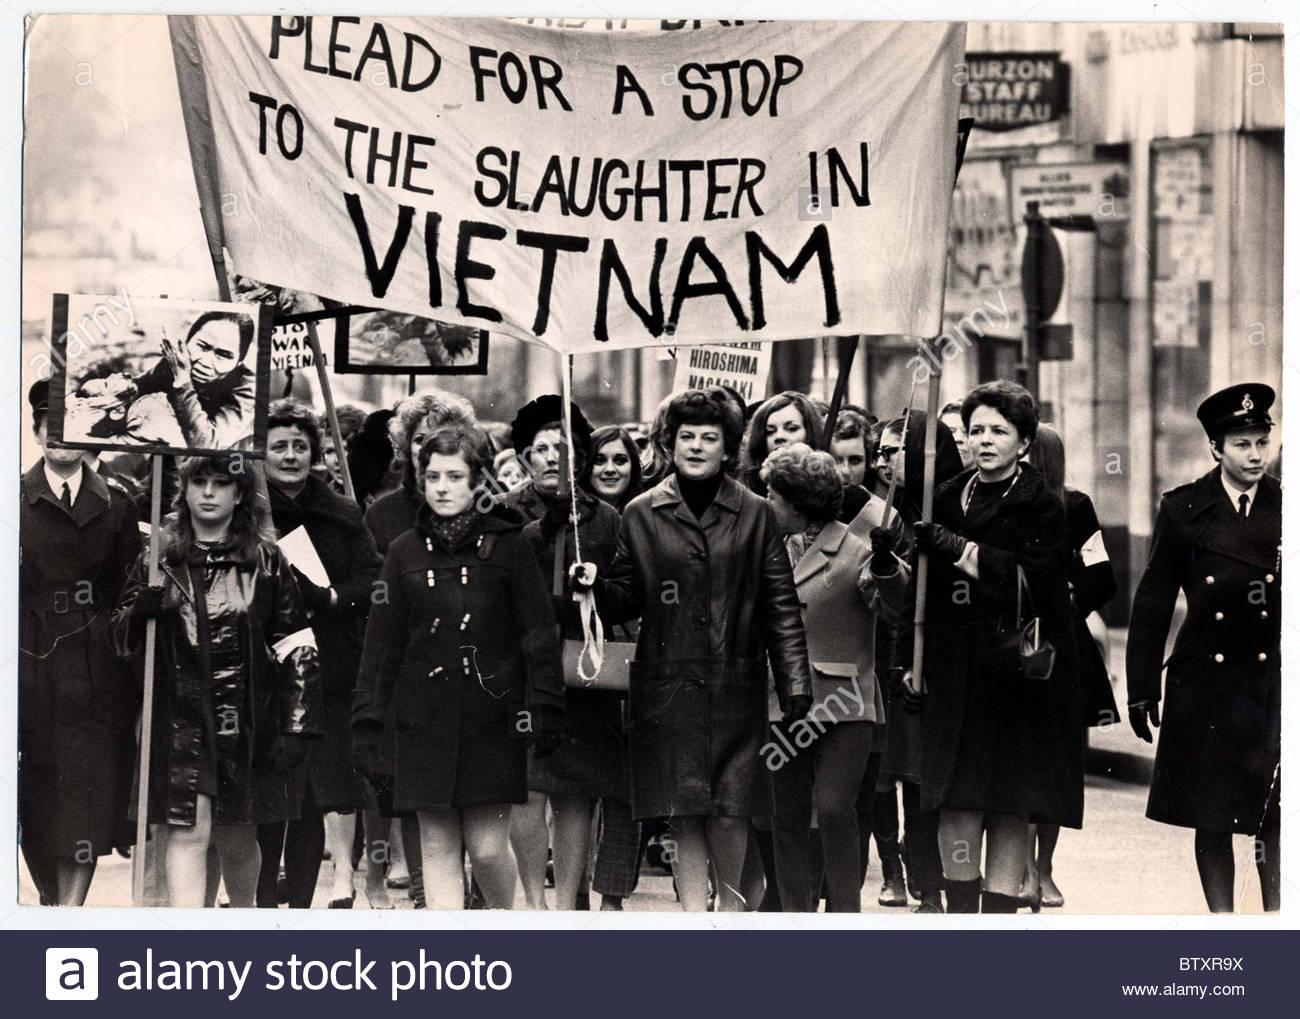 Vietnam Anti War Protests 1968on 2014 Toyota Corolla S Interior